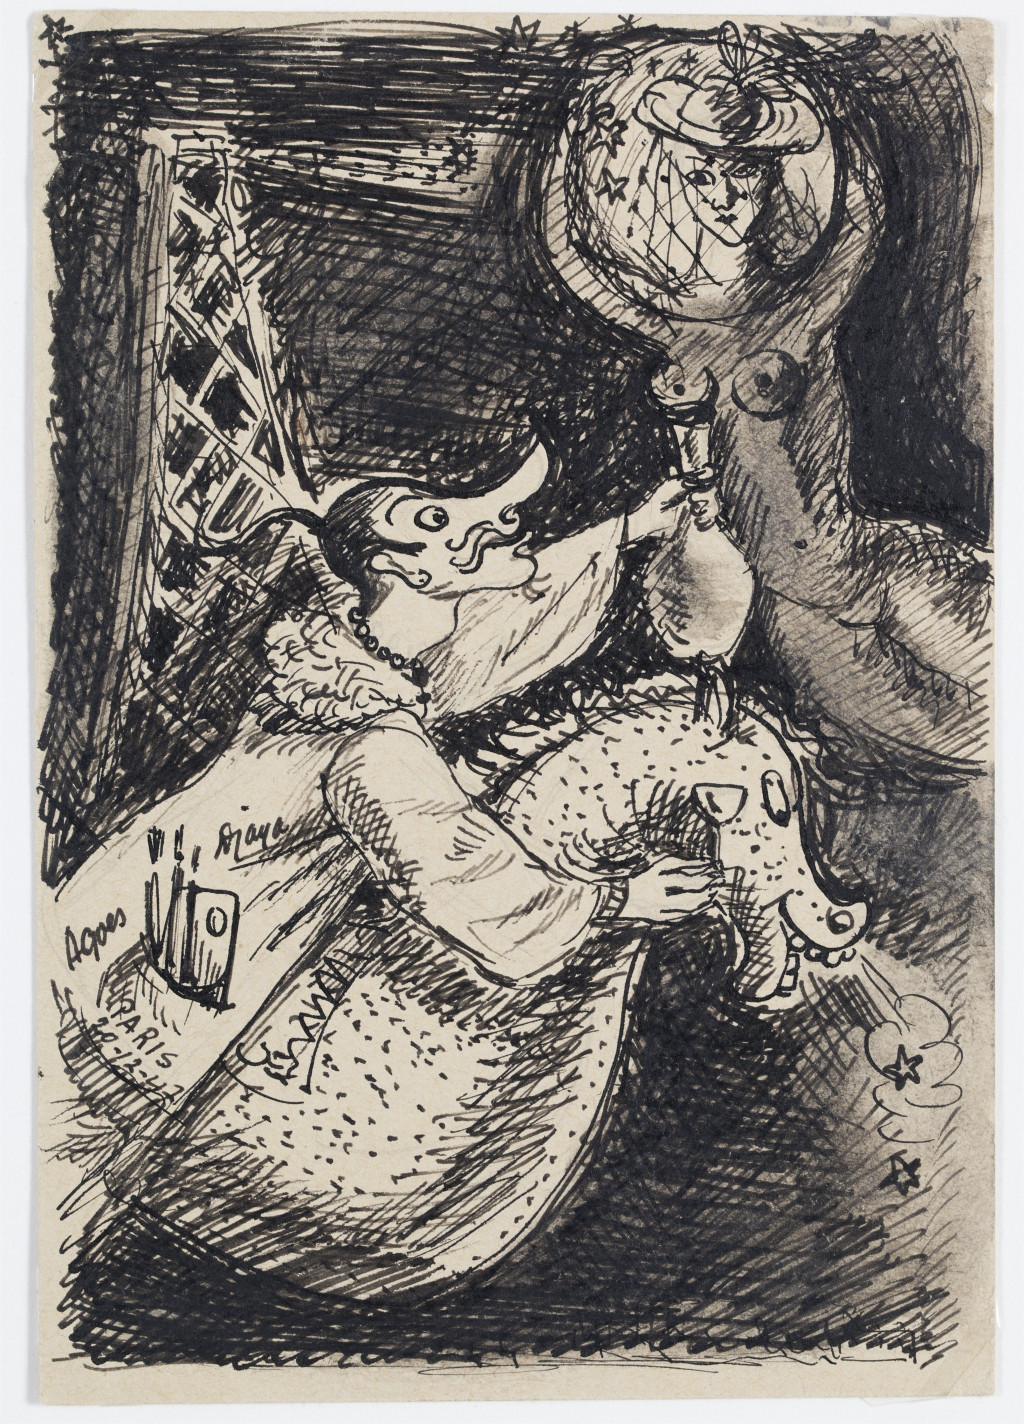 Ill.1 Agus Djaya, Untitled, 1947, Stedelijk Museum Amsterdam